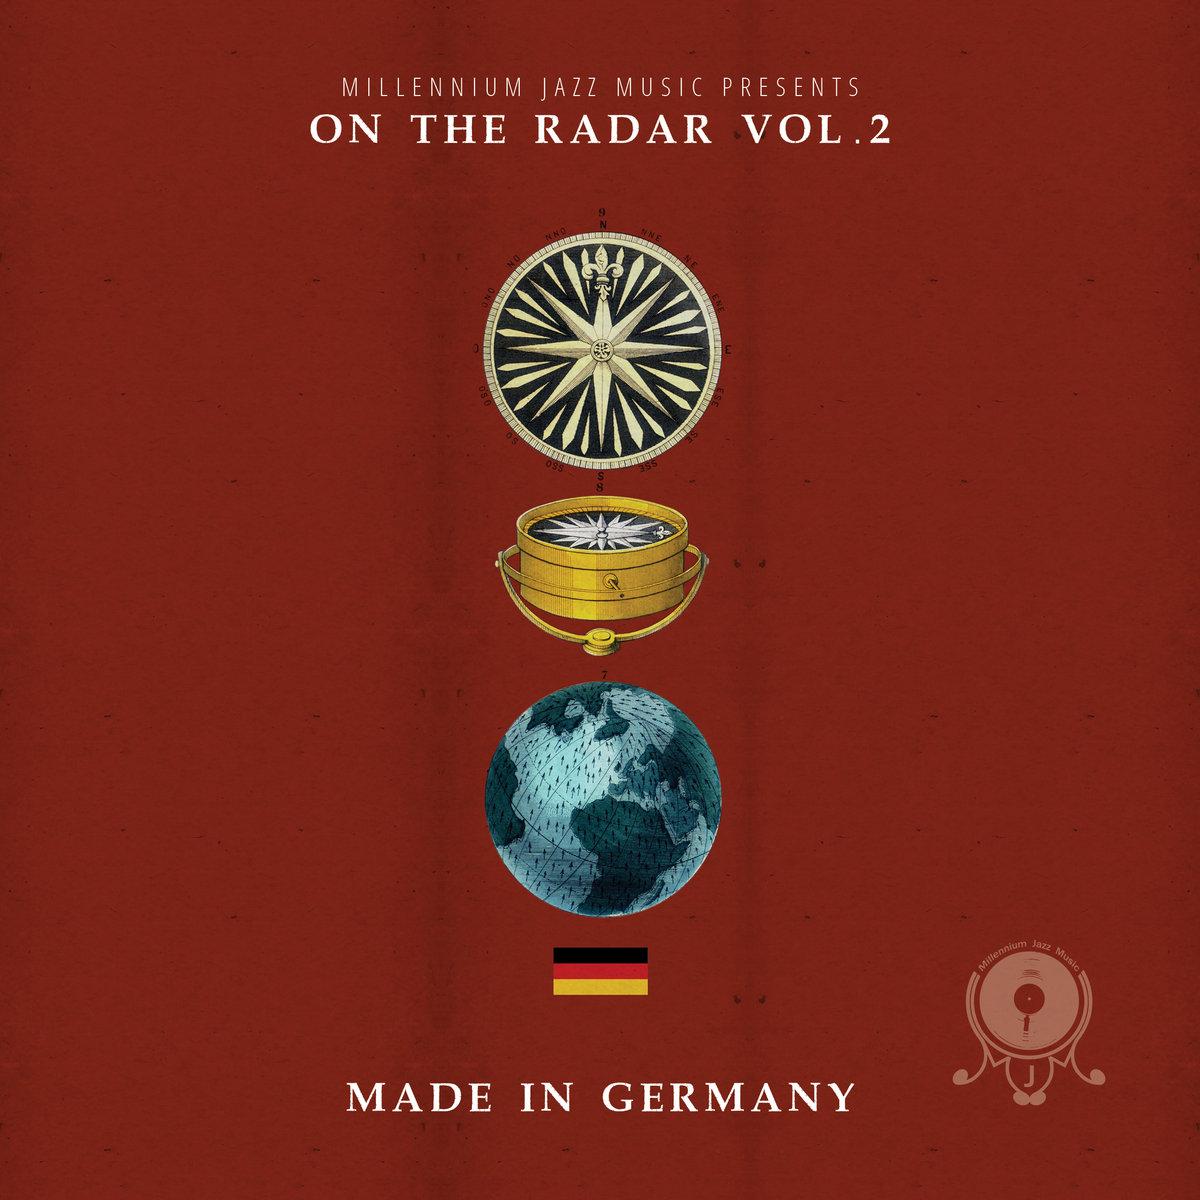 Made In Germany Otr Vol 2 Millennium Jazz Music